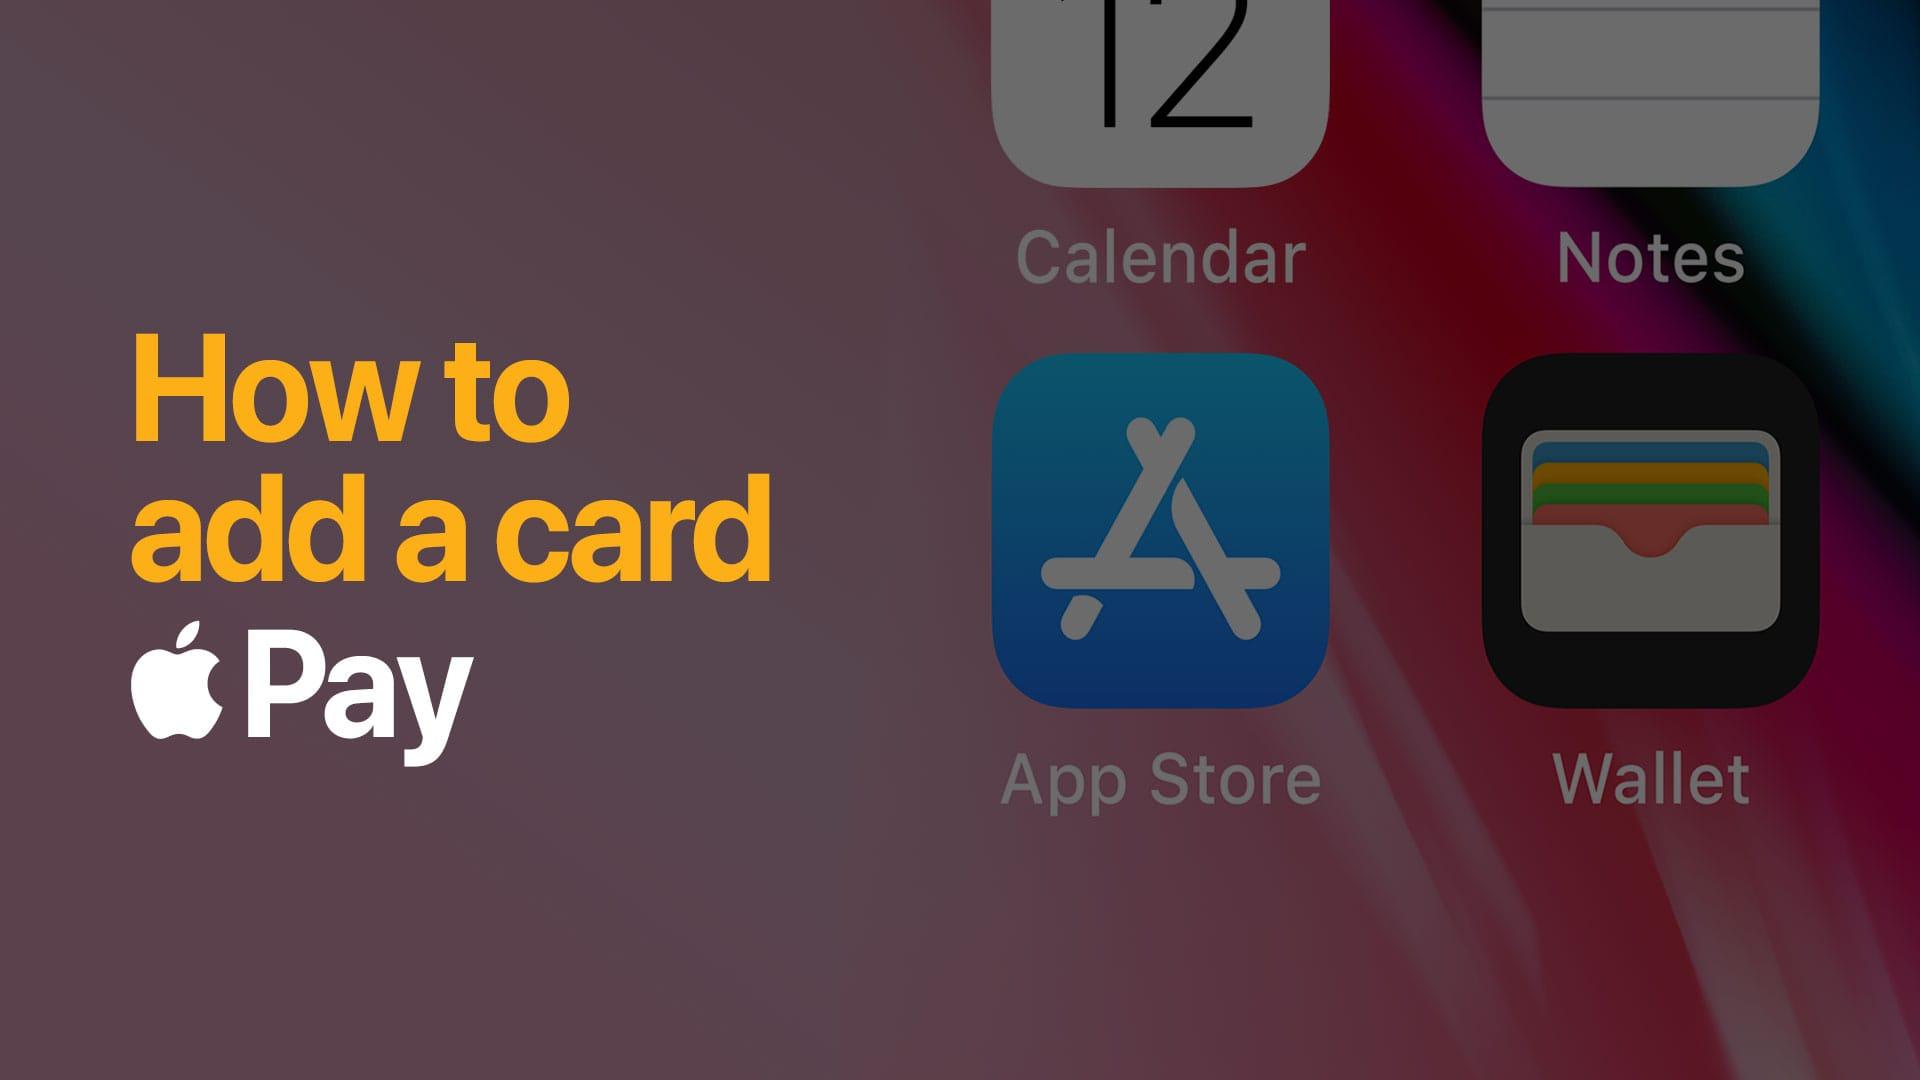 add_a_card